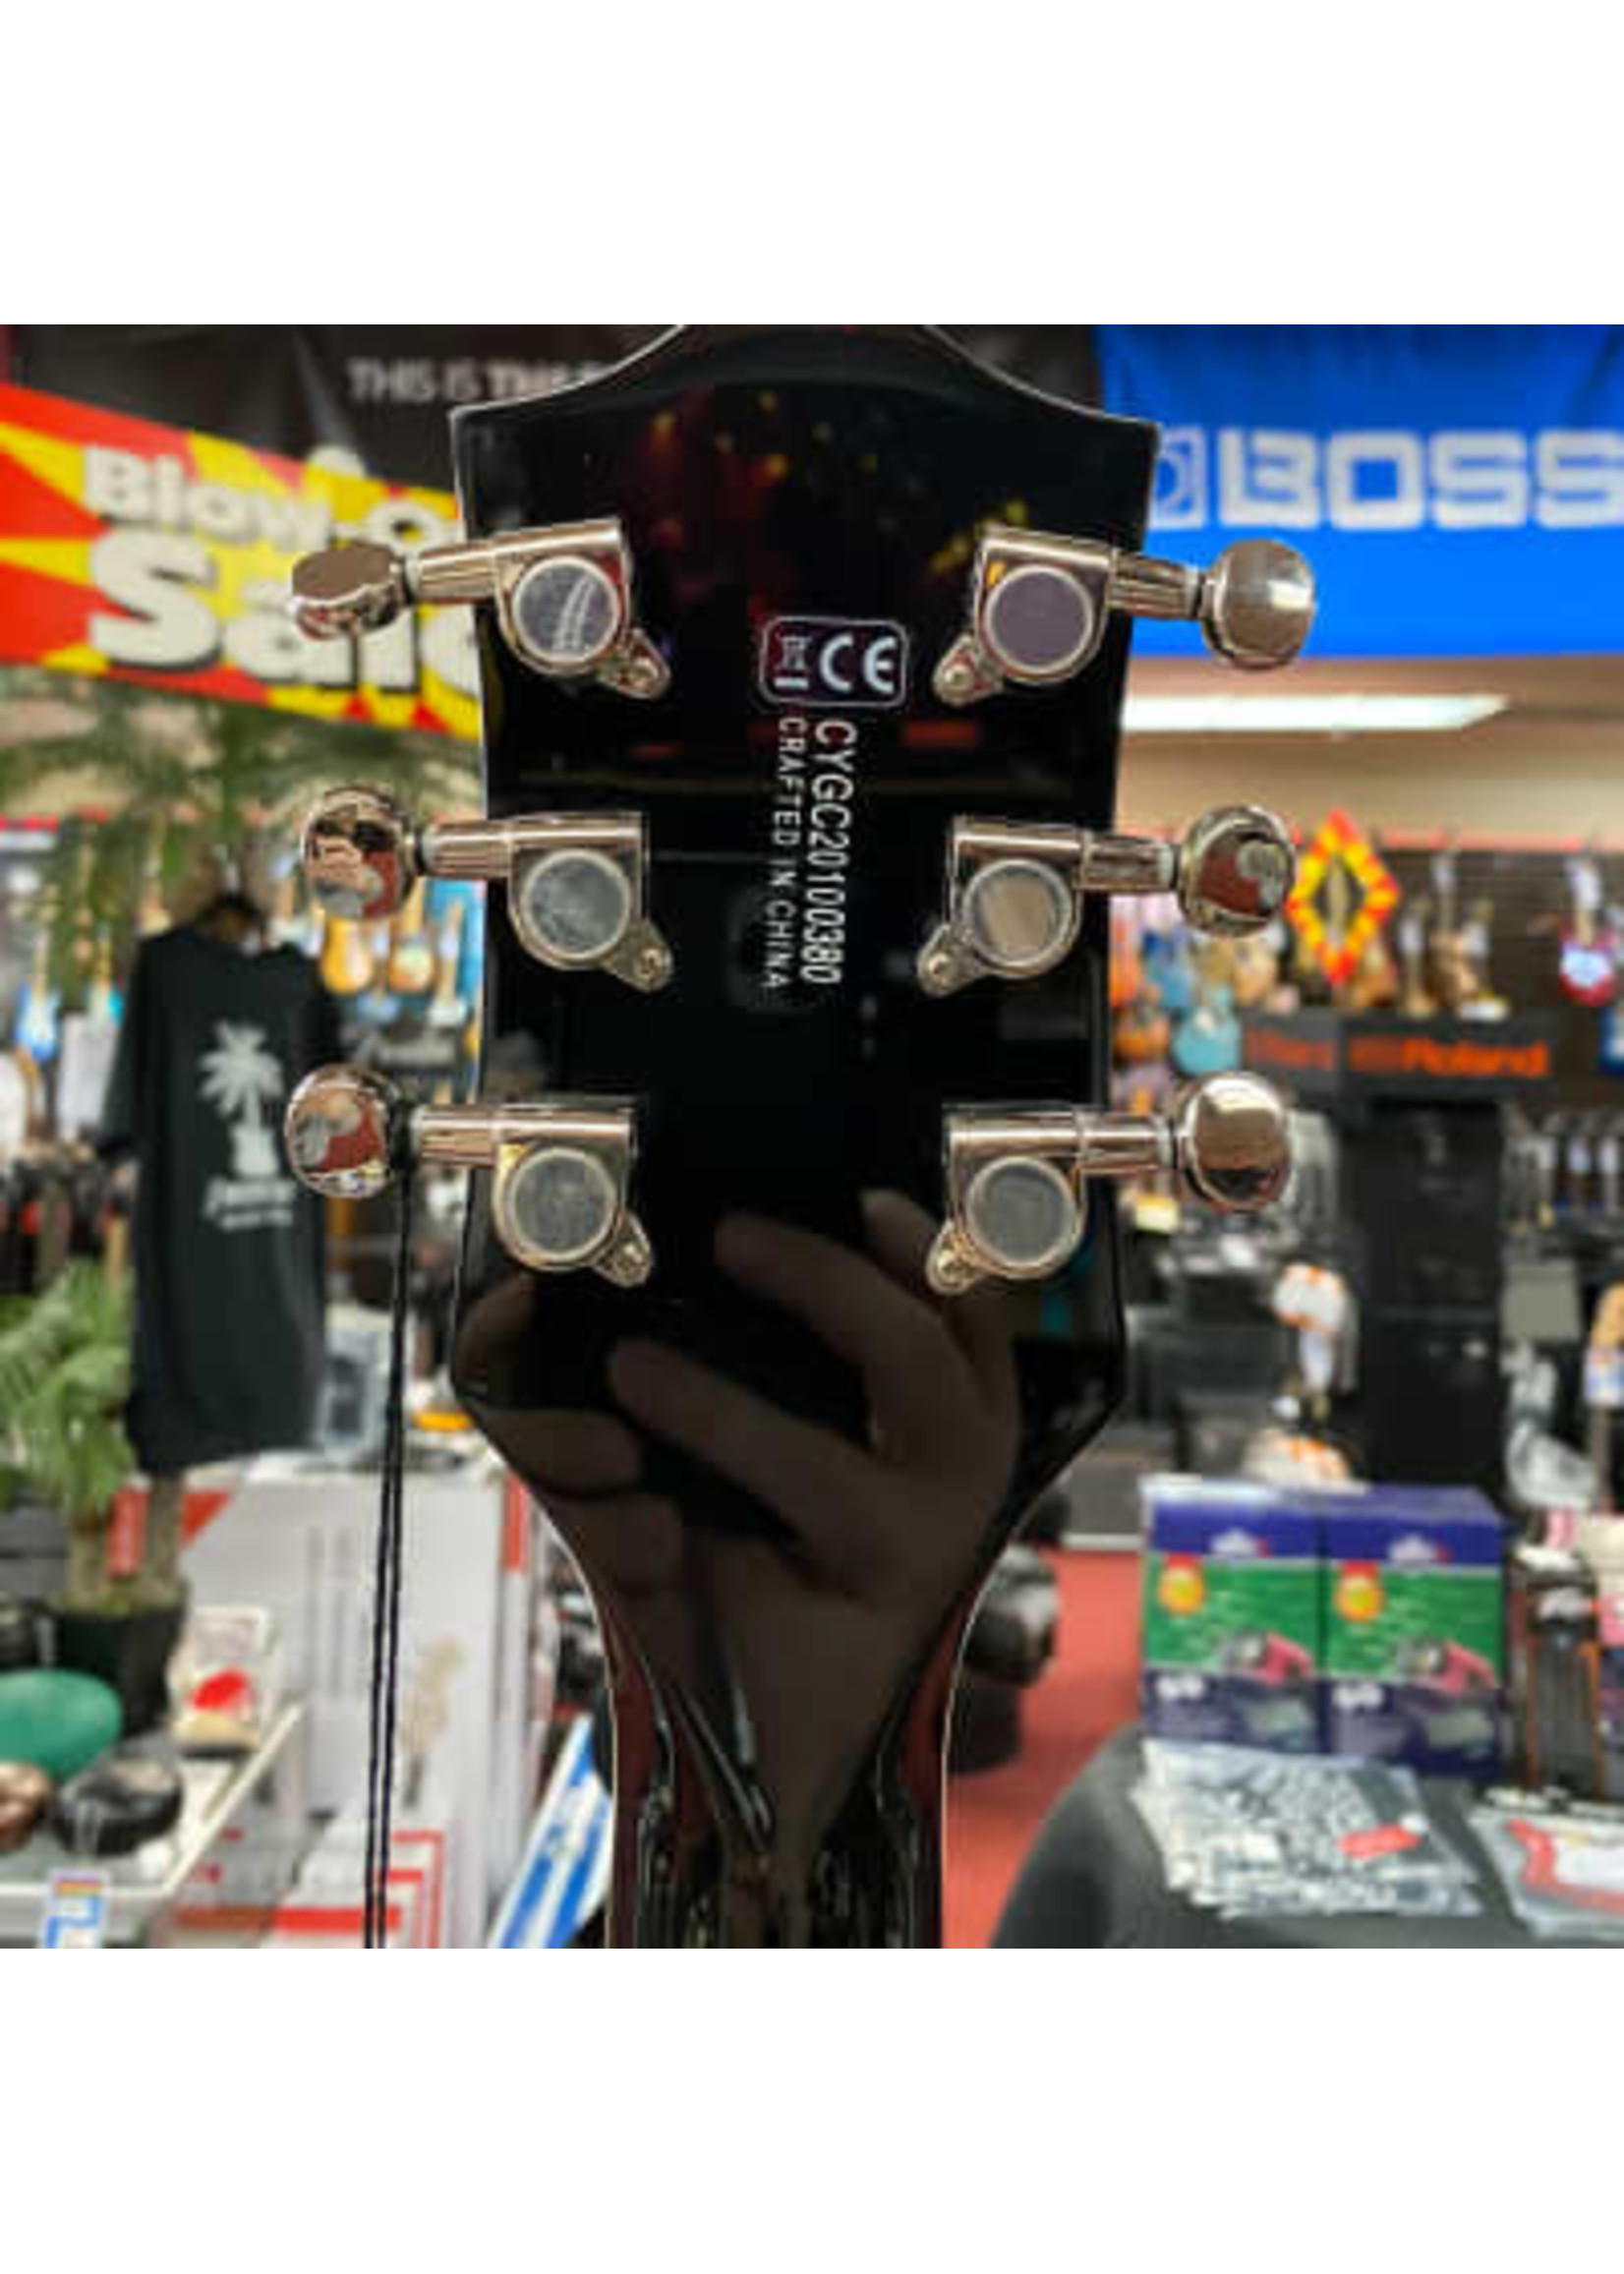 Gretsch Gretsch G5622 Electromatic® Center Block Double-Cut w/ V-Stoptail, Laurel Fingerboard, Bristol Fog